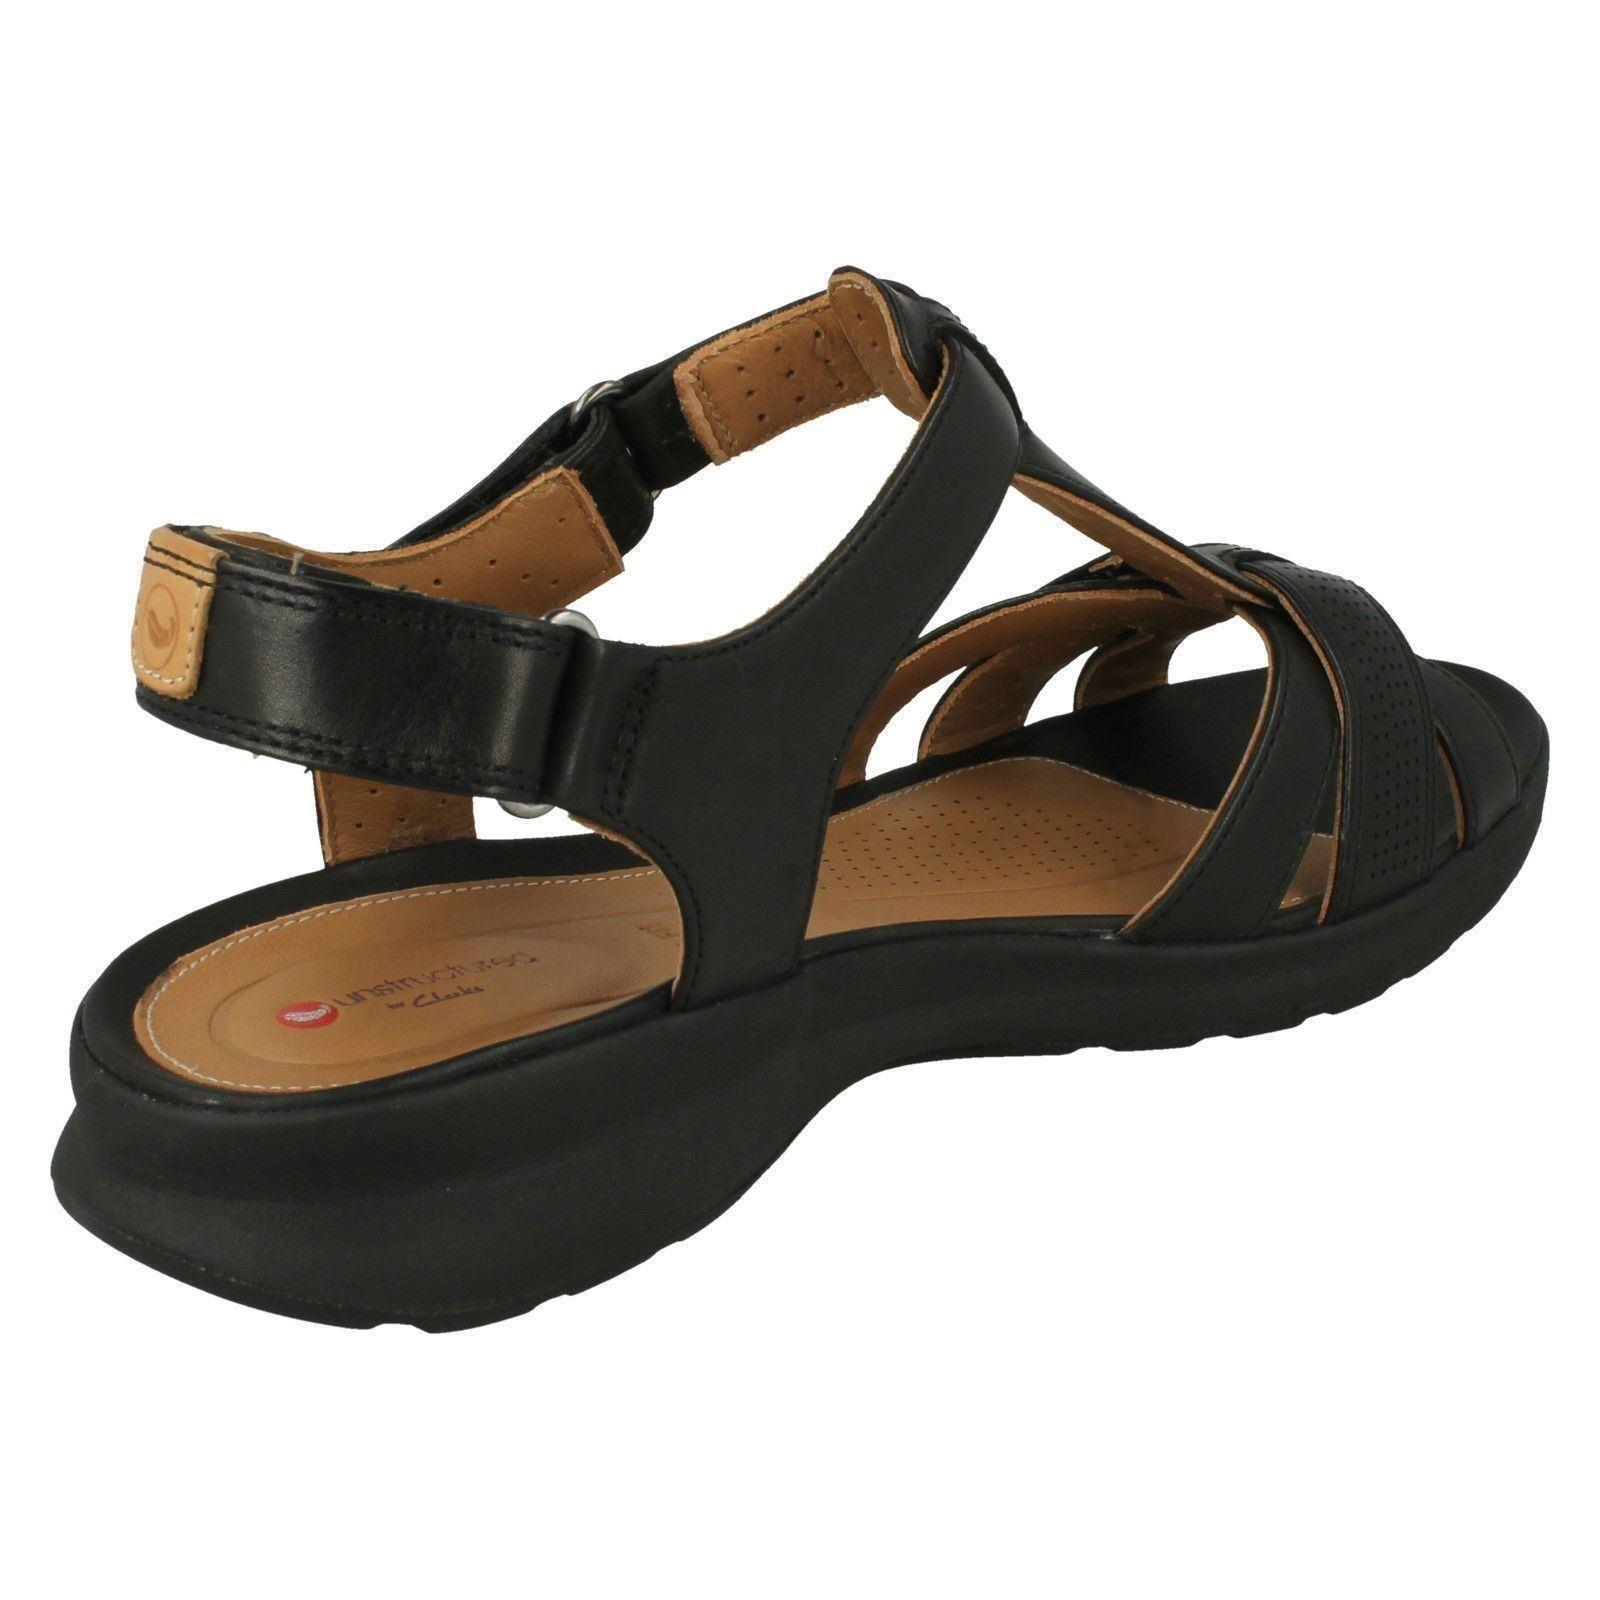 Details about Ladies Clarks Unstructured Wide Fit Hook & Loop Leather Sandals Un Adorn Vibe